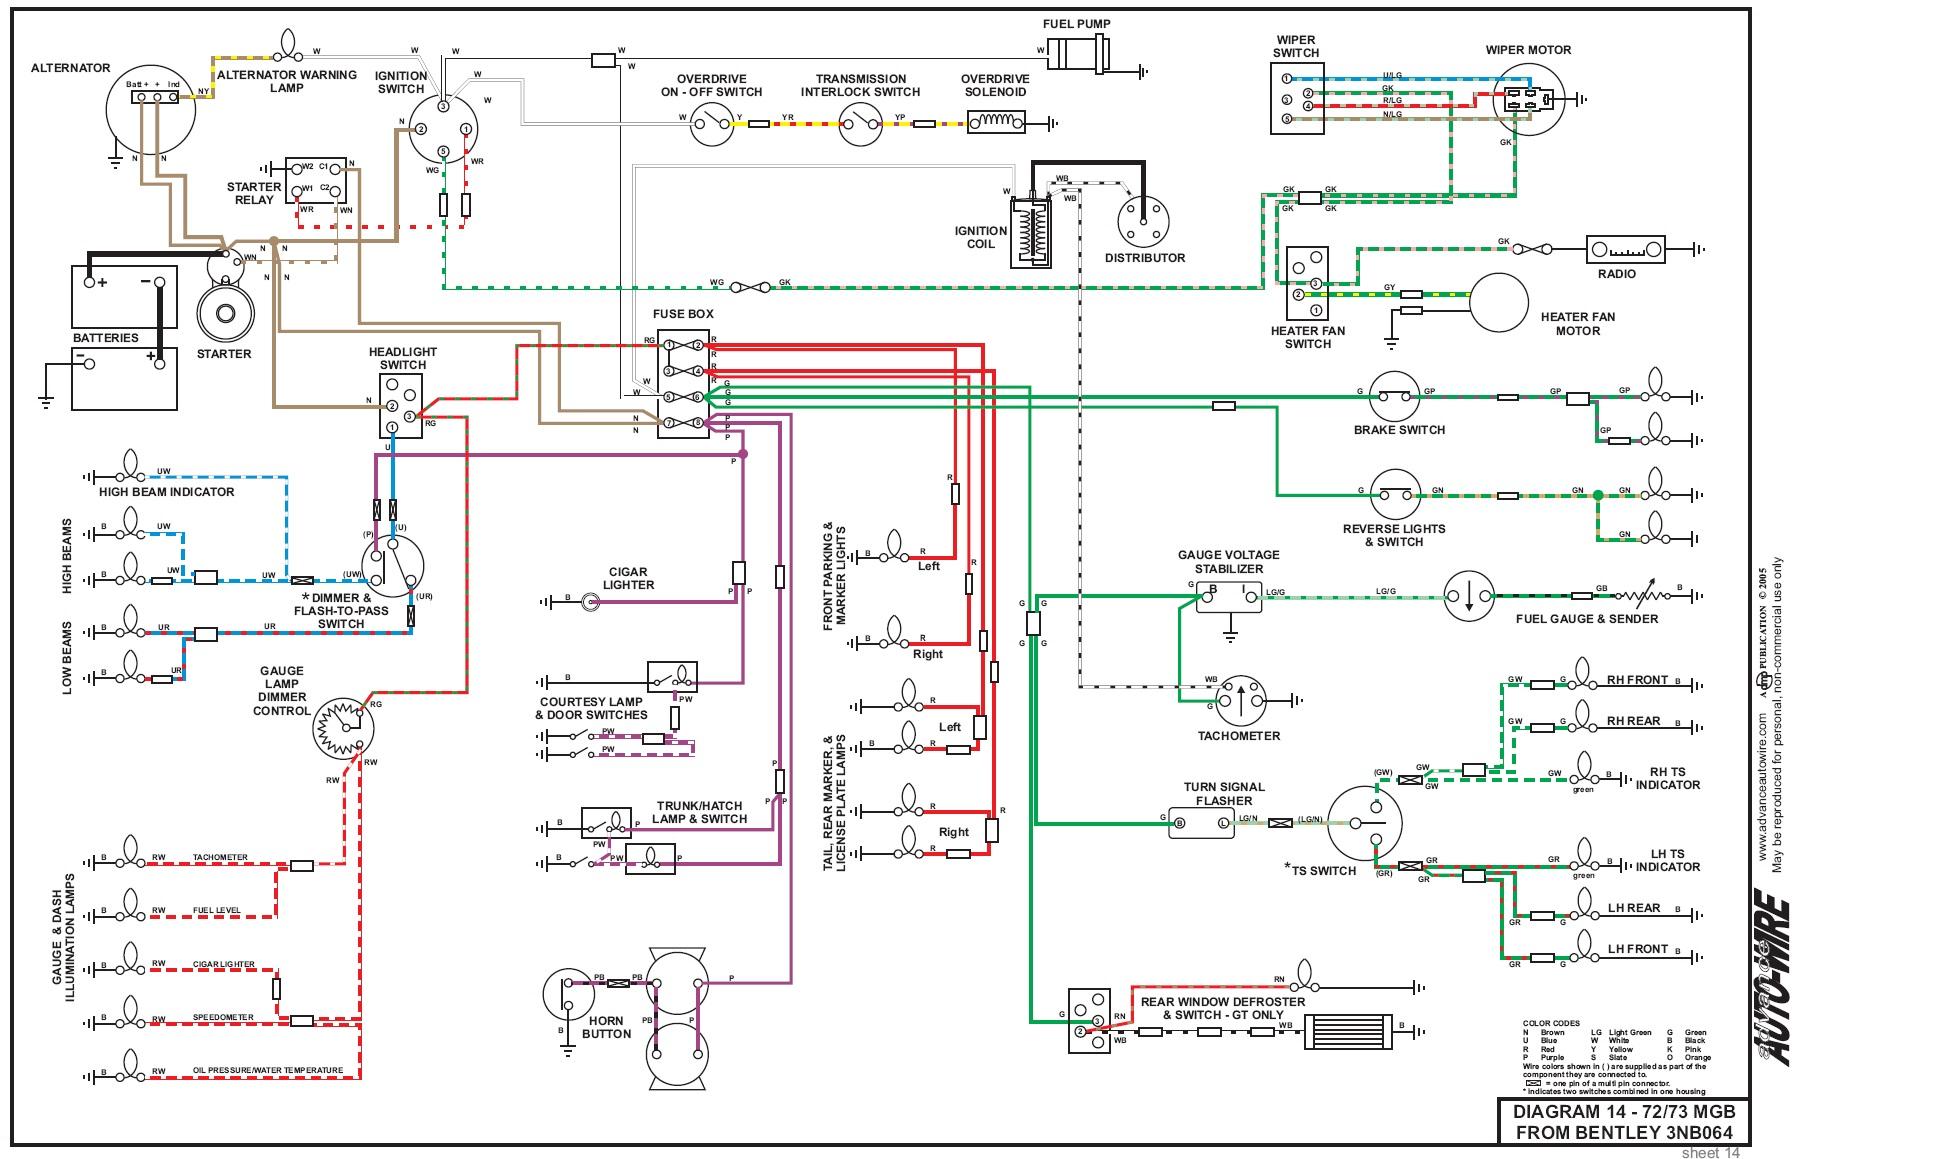 mgb indicator wiring diagram 7r sprachentogo de u2022 rh 7r sprachentogo de mgb wiring diagram 1979 mgb wiring diagram 1979